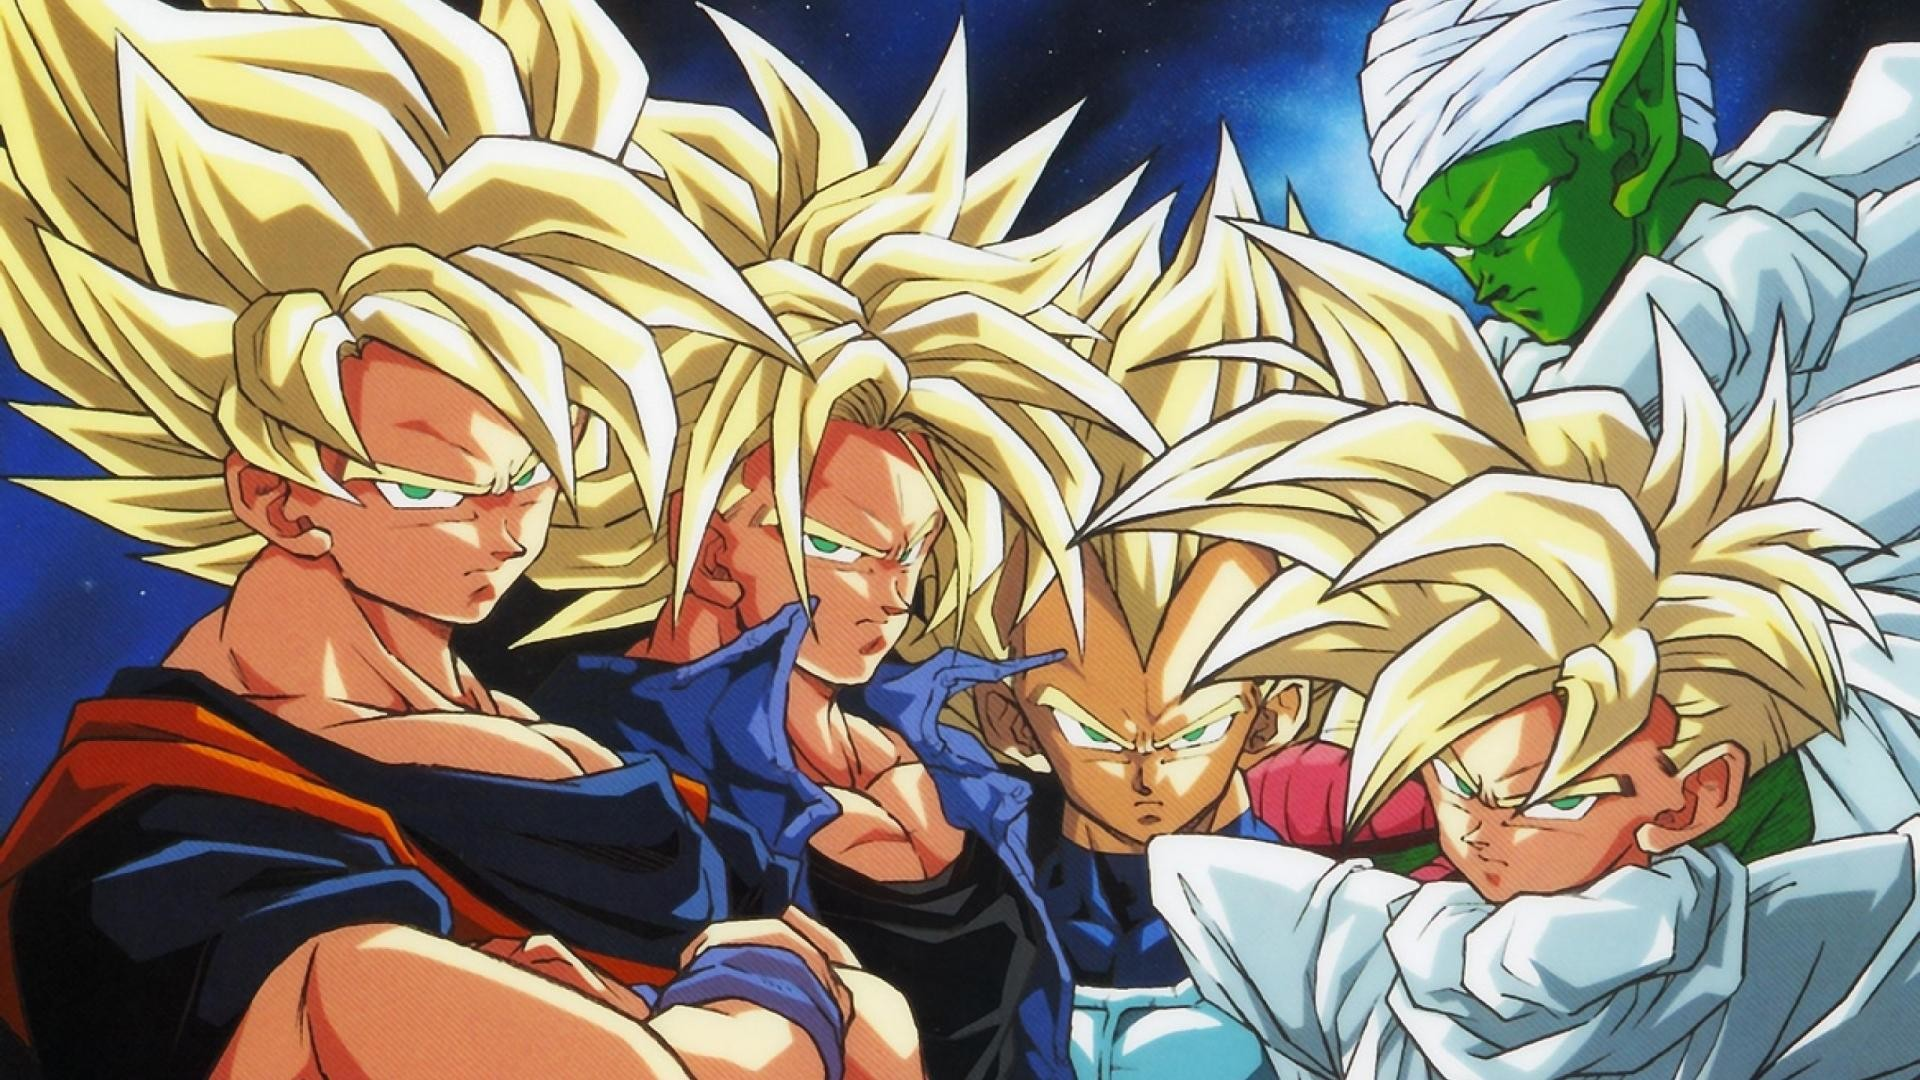 2160x3840 Dragon Ball Z Goku Vs Vegeta